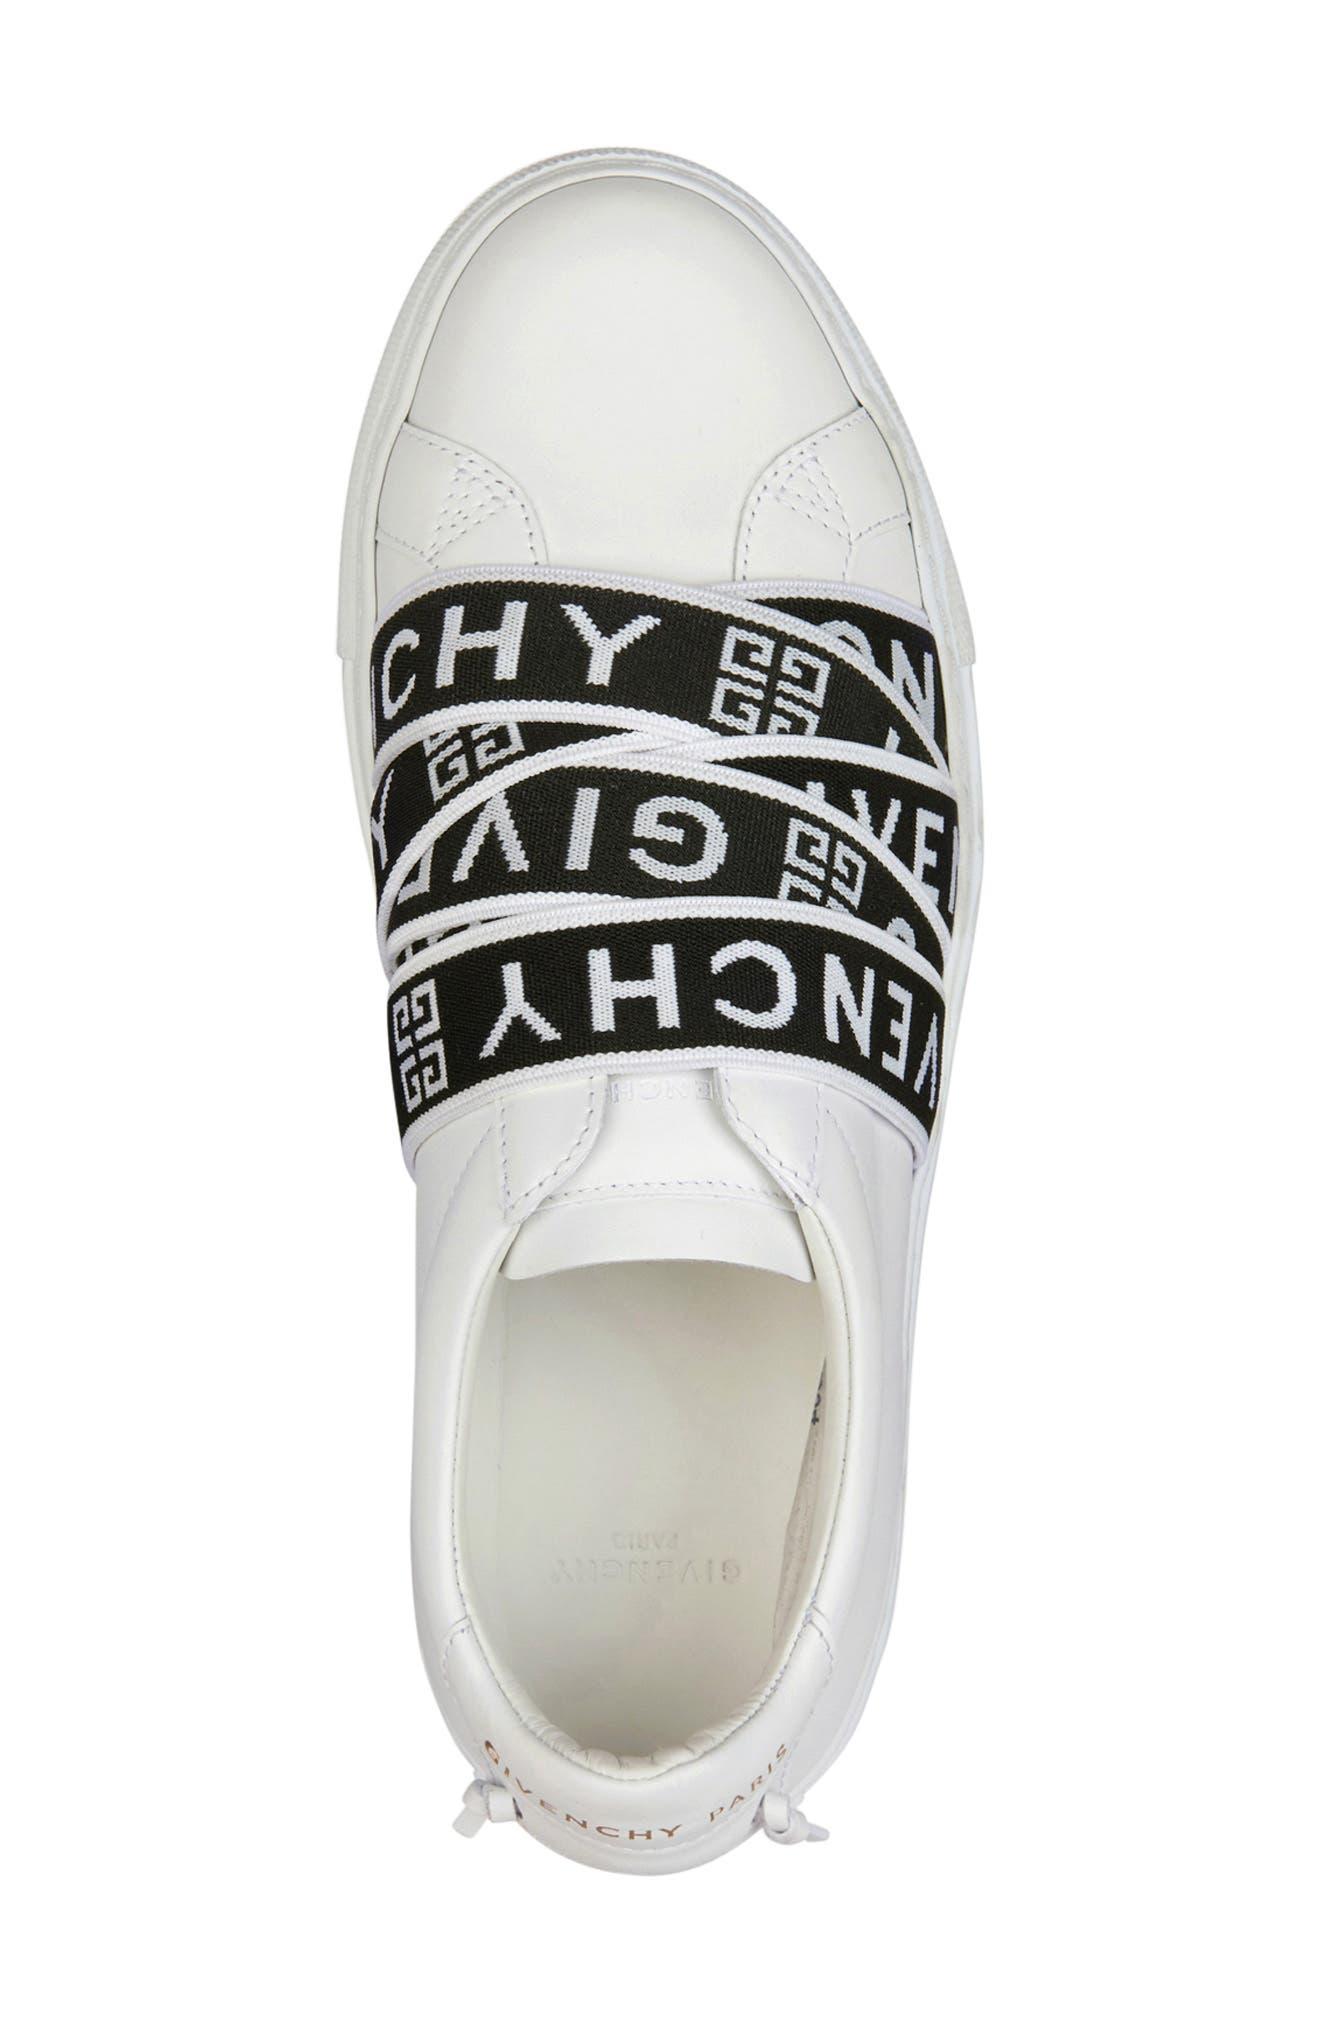 GIVENCHY,                             Urban Street Logo Strap Sneaker,                             Alternate thumbnail 4, color,                             WHITE/ BLACK